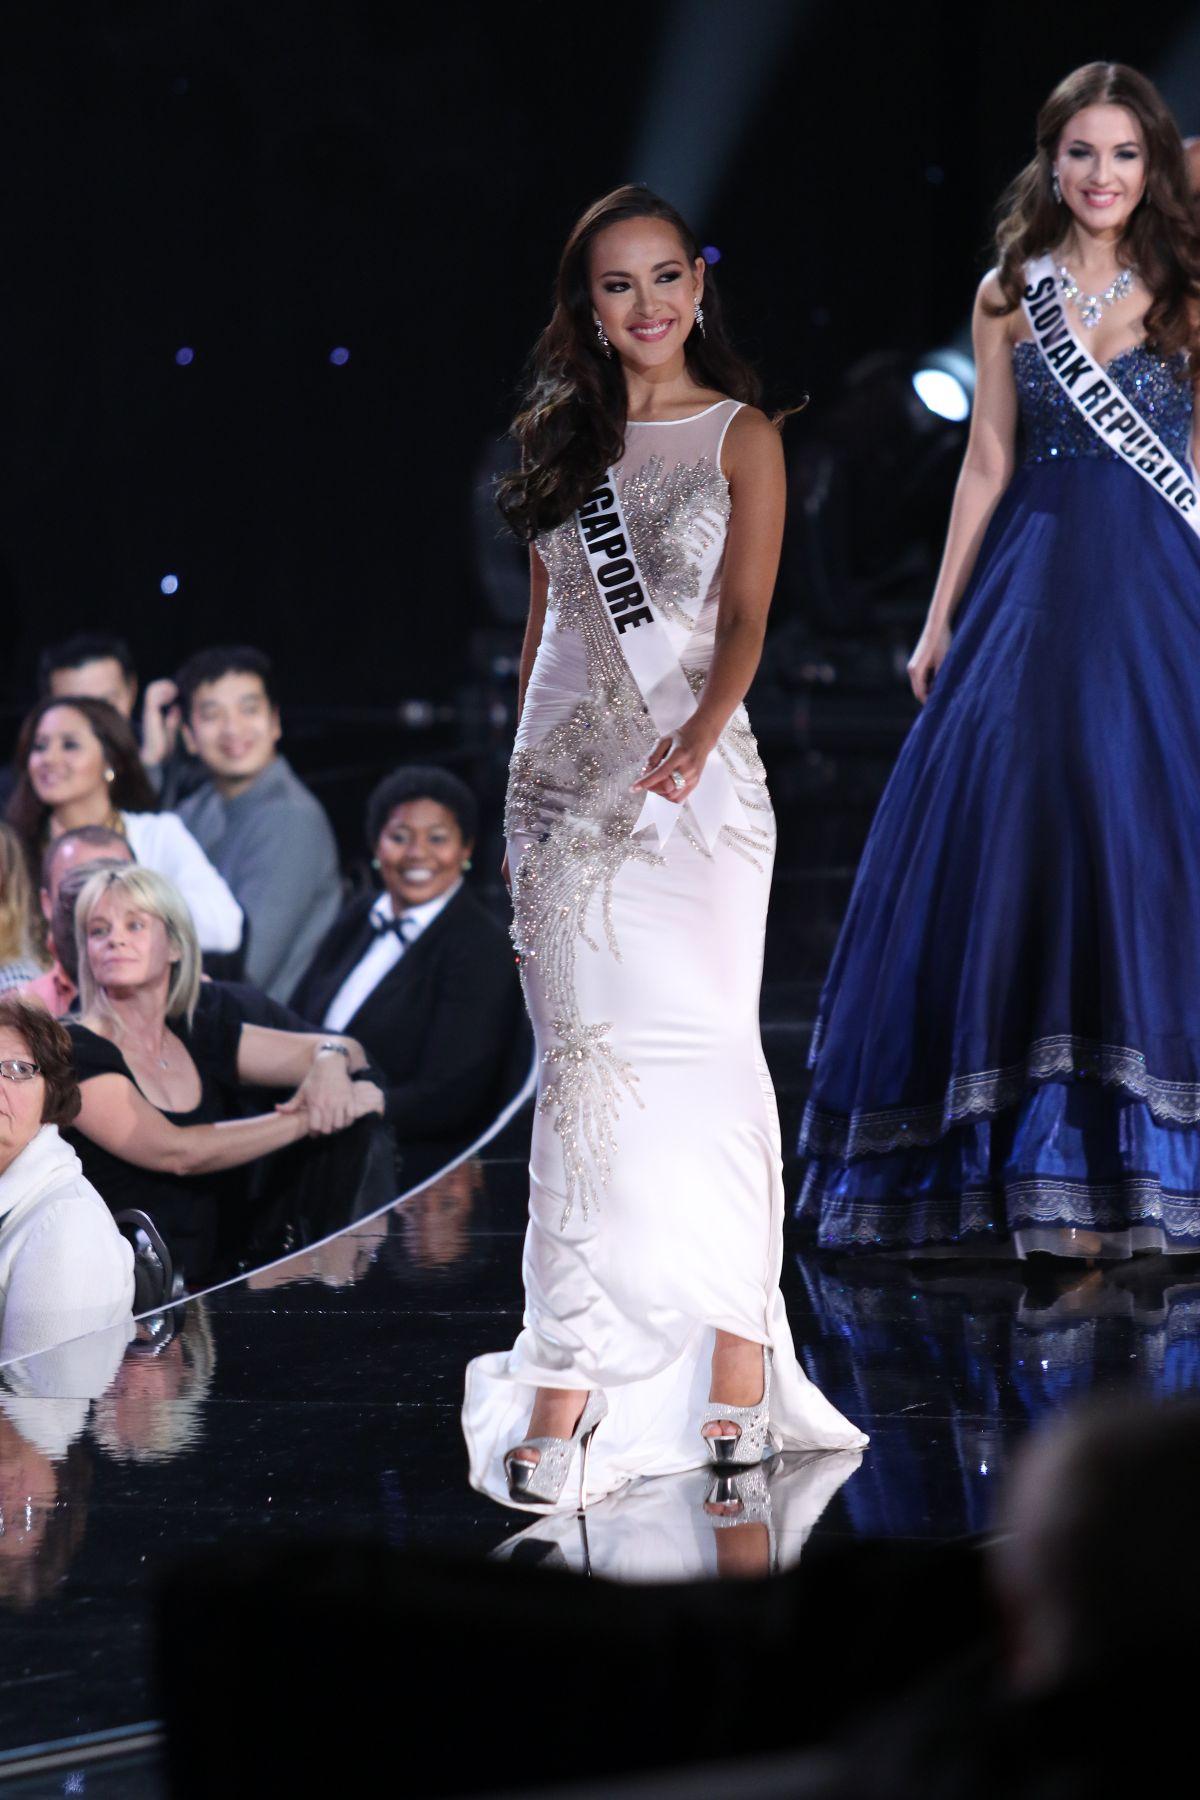 https://www.hawtcelebs.com/wp-content/uploads/2015/12/lisa-marie-white-miss-universe-2015-preliminary-round-12-16-2015_3.jpg